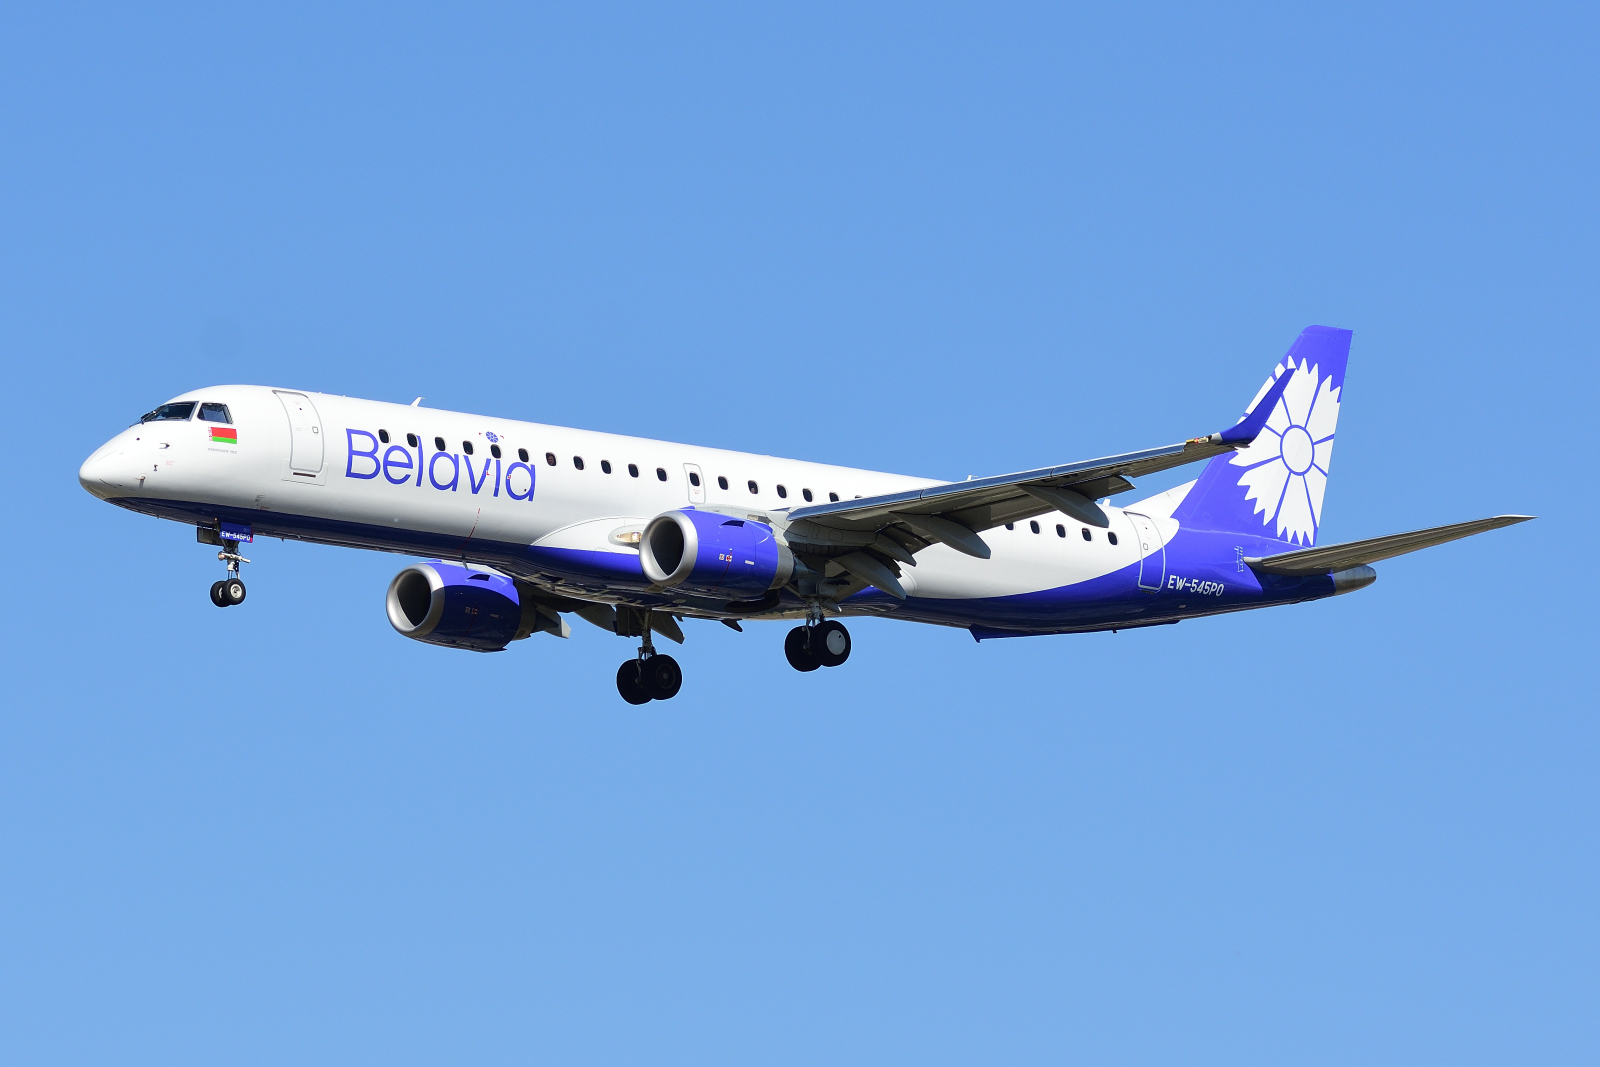 EW-545PO, Embraer 195